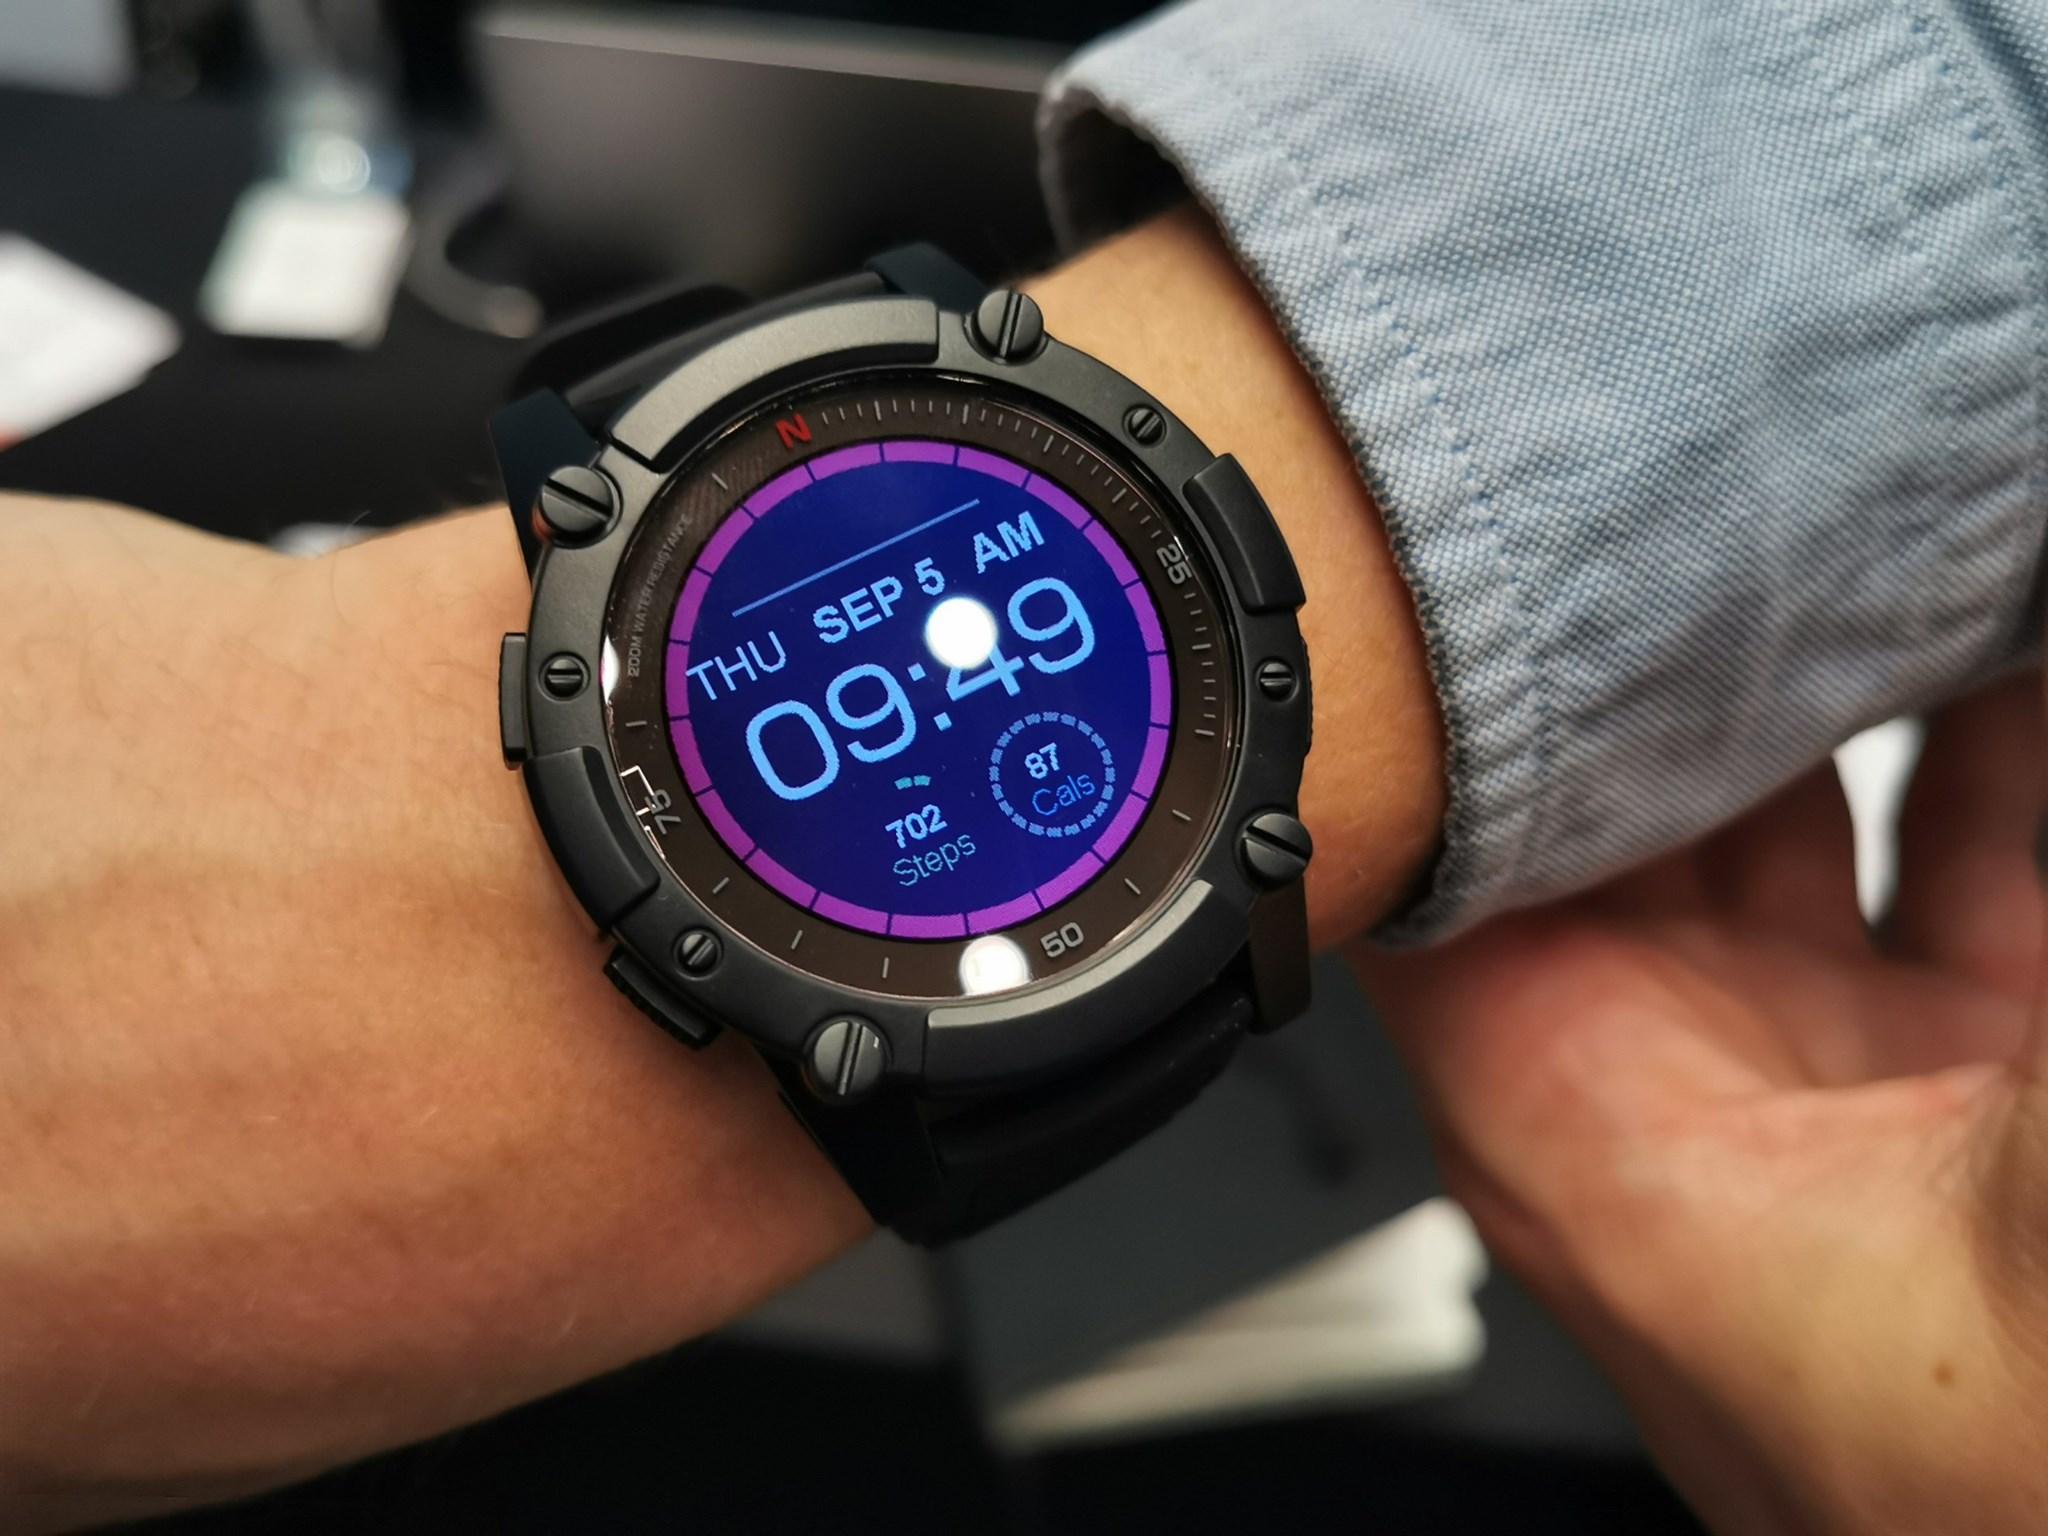 Powerwatch 2 | firmware V2.4.0R1